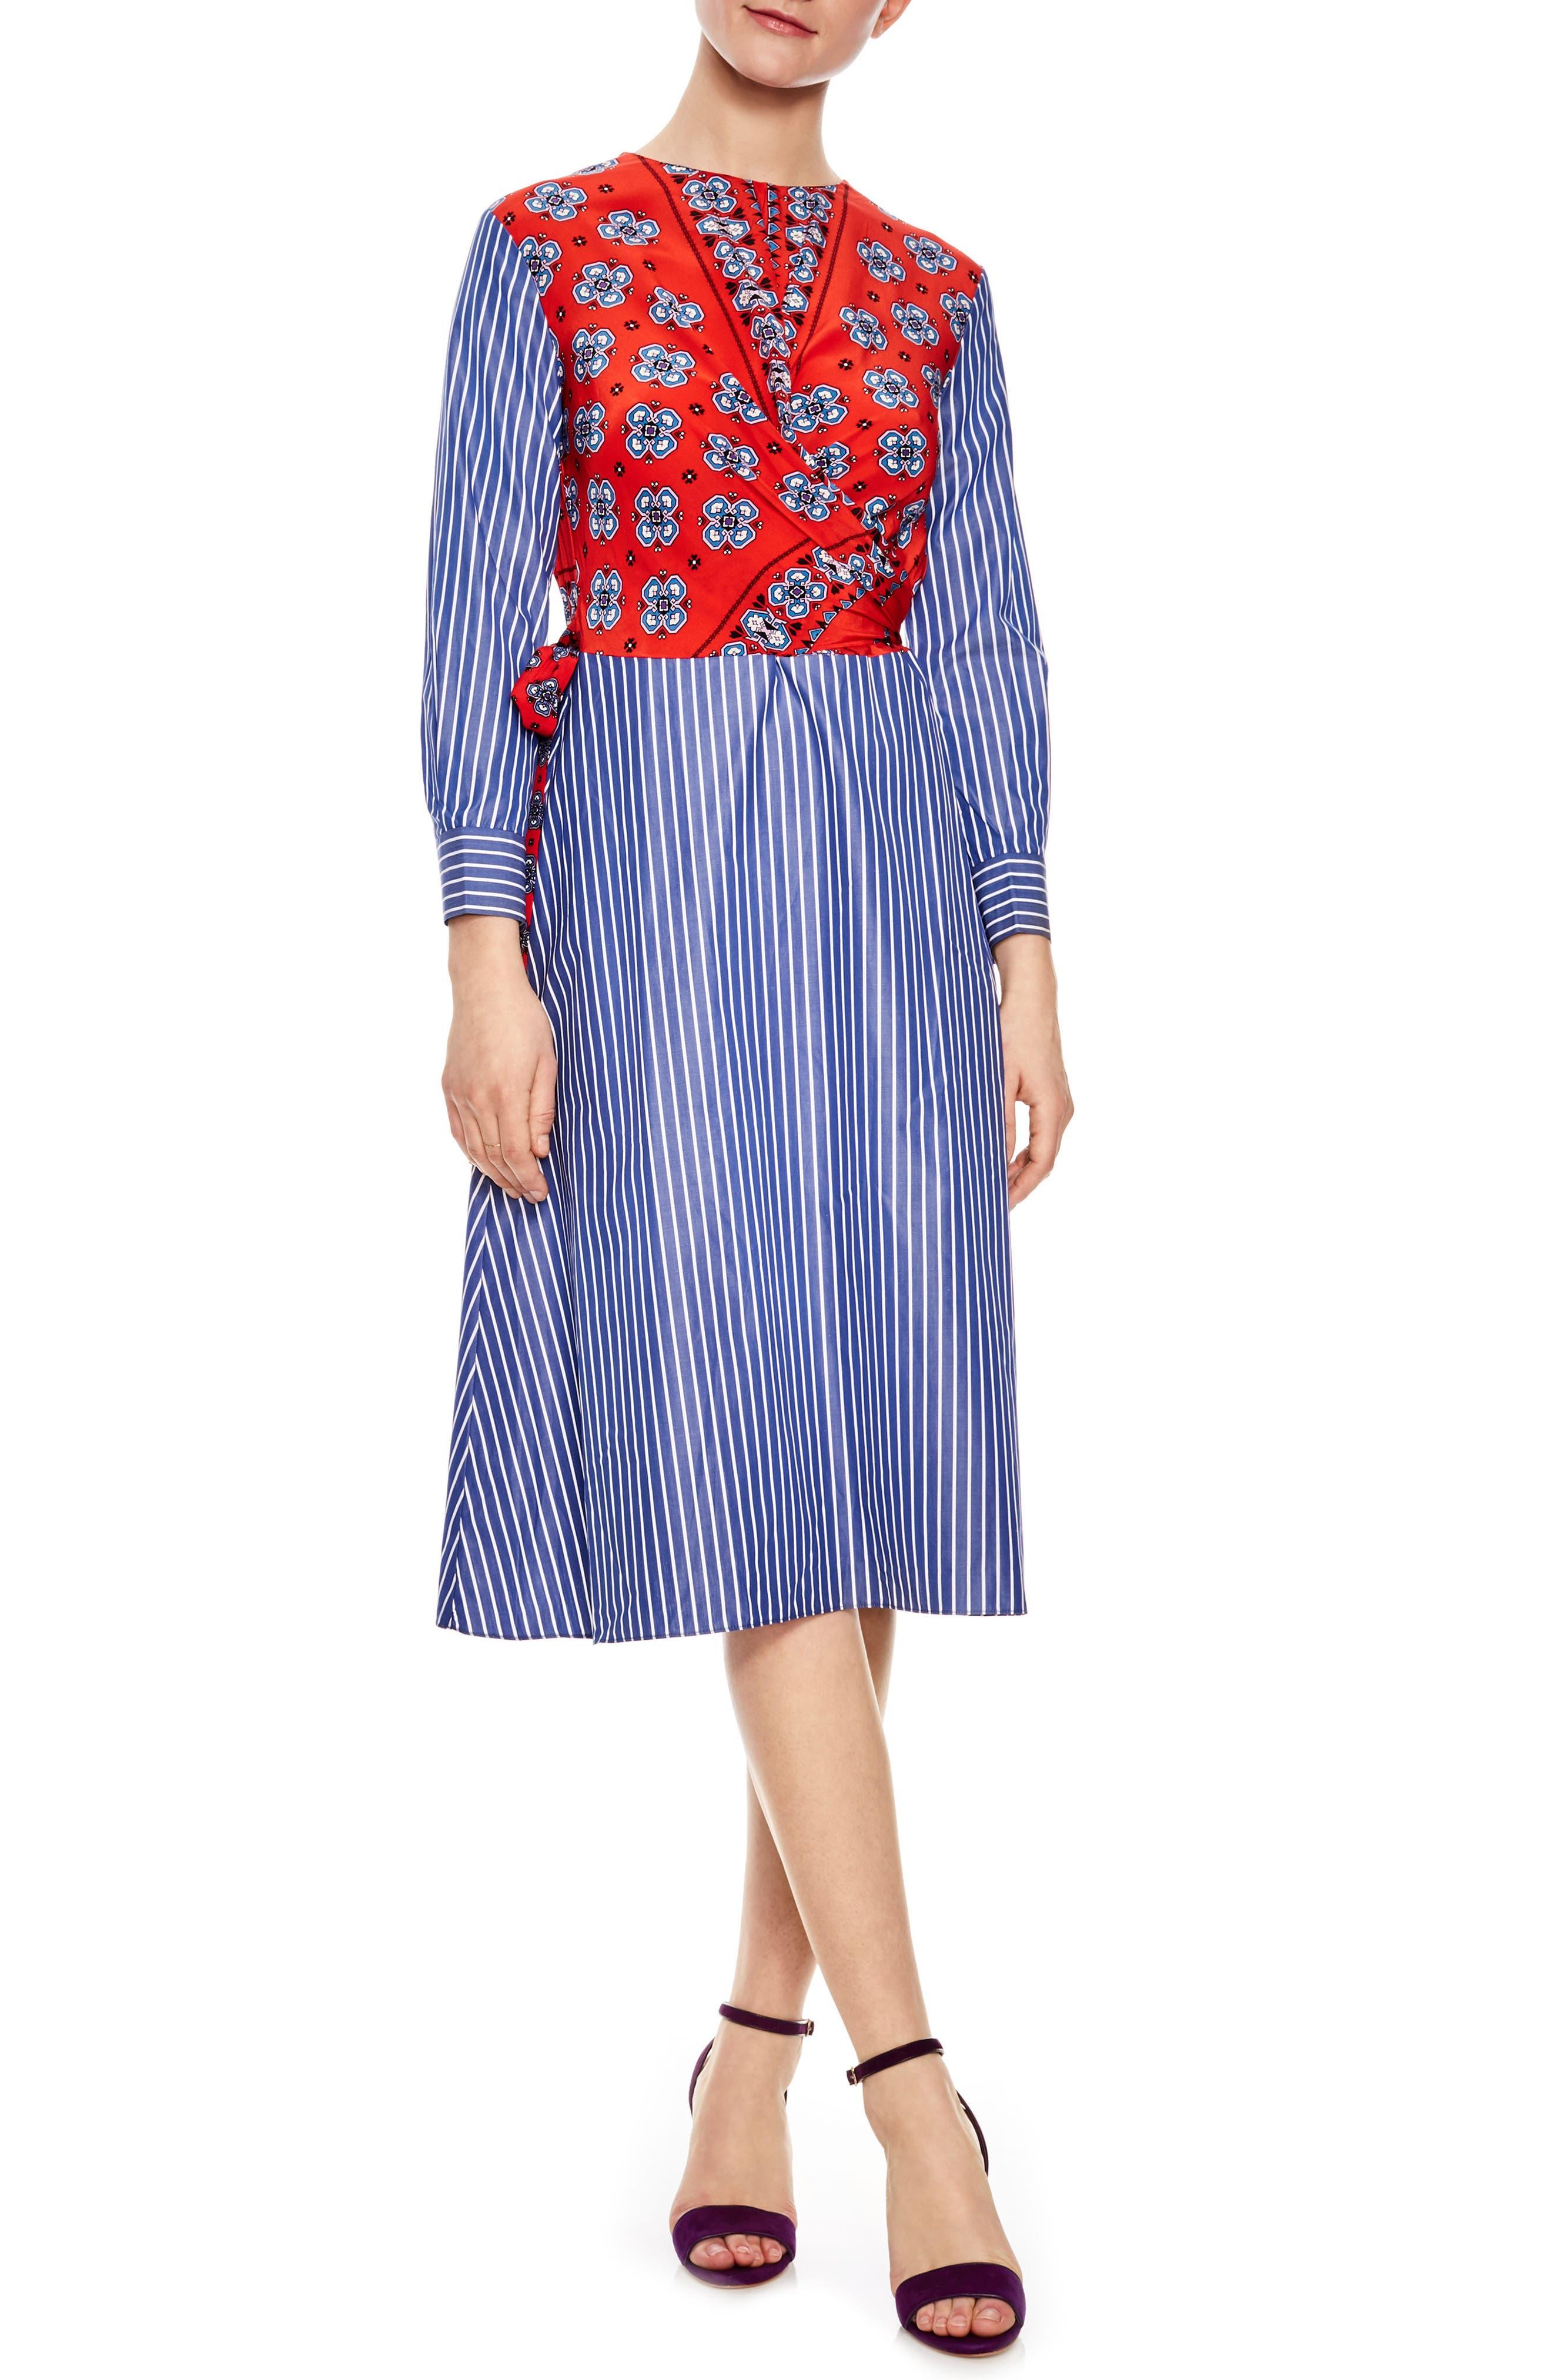 Mixed Print Cotton & Silk Faux Wrap Dress,                             Main thumbnail 1, color,                             600